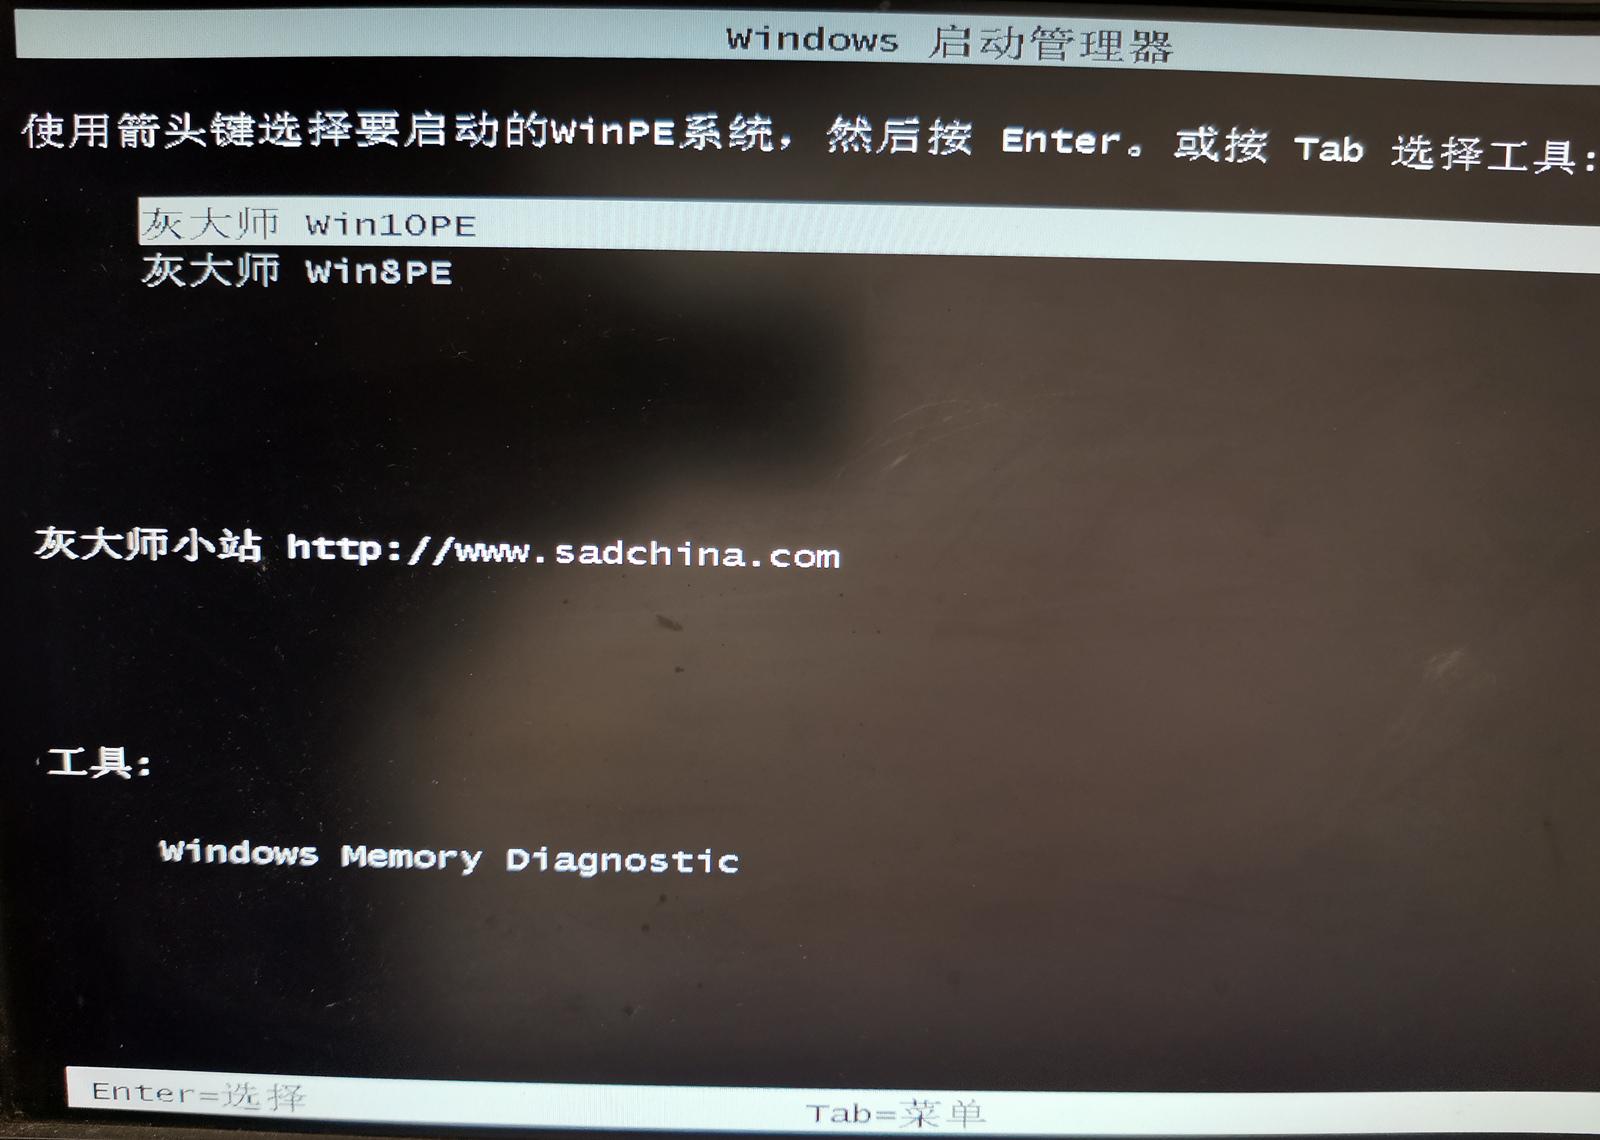 灰大师Win8PE_Win10PE二合一iso镜像下载